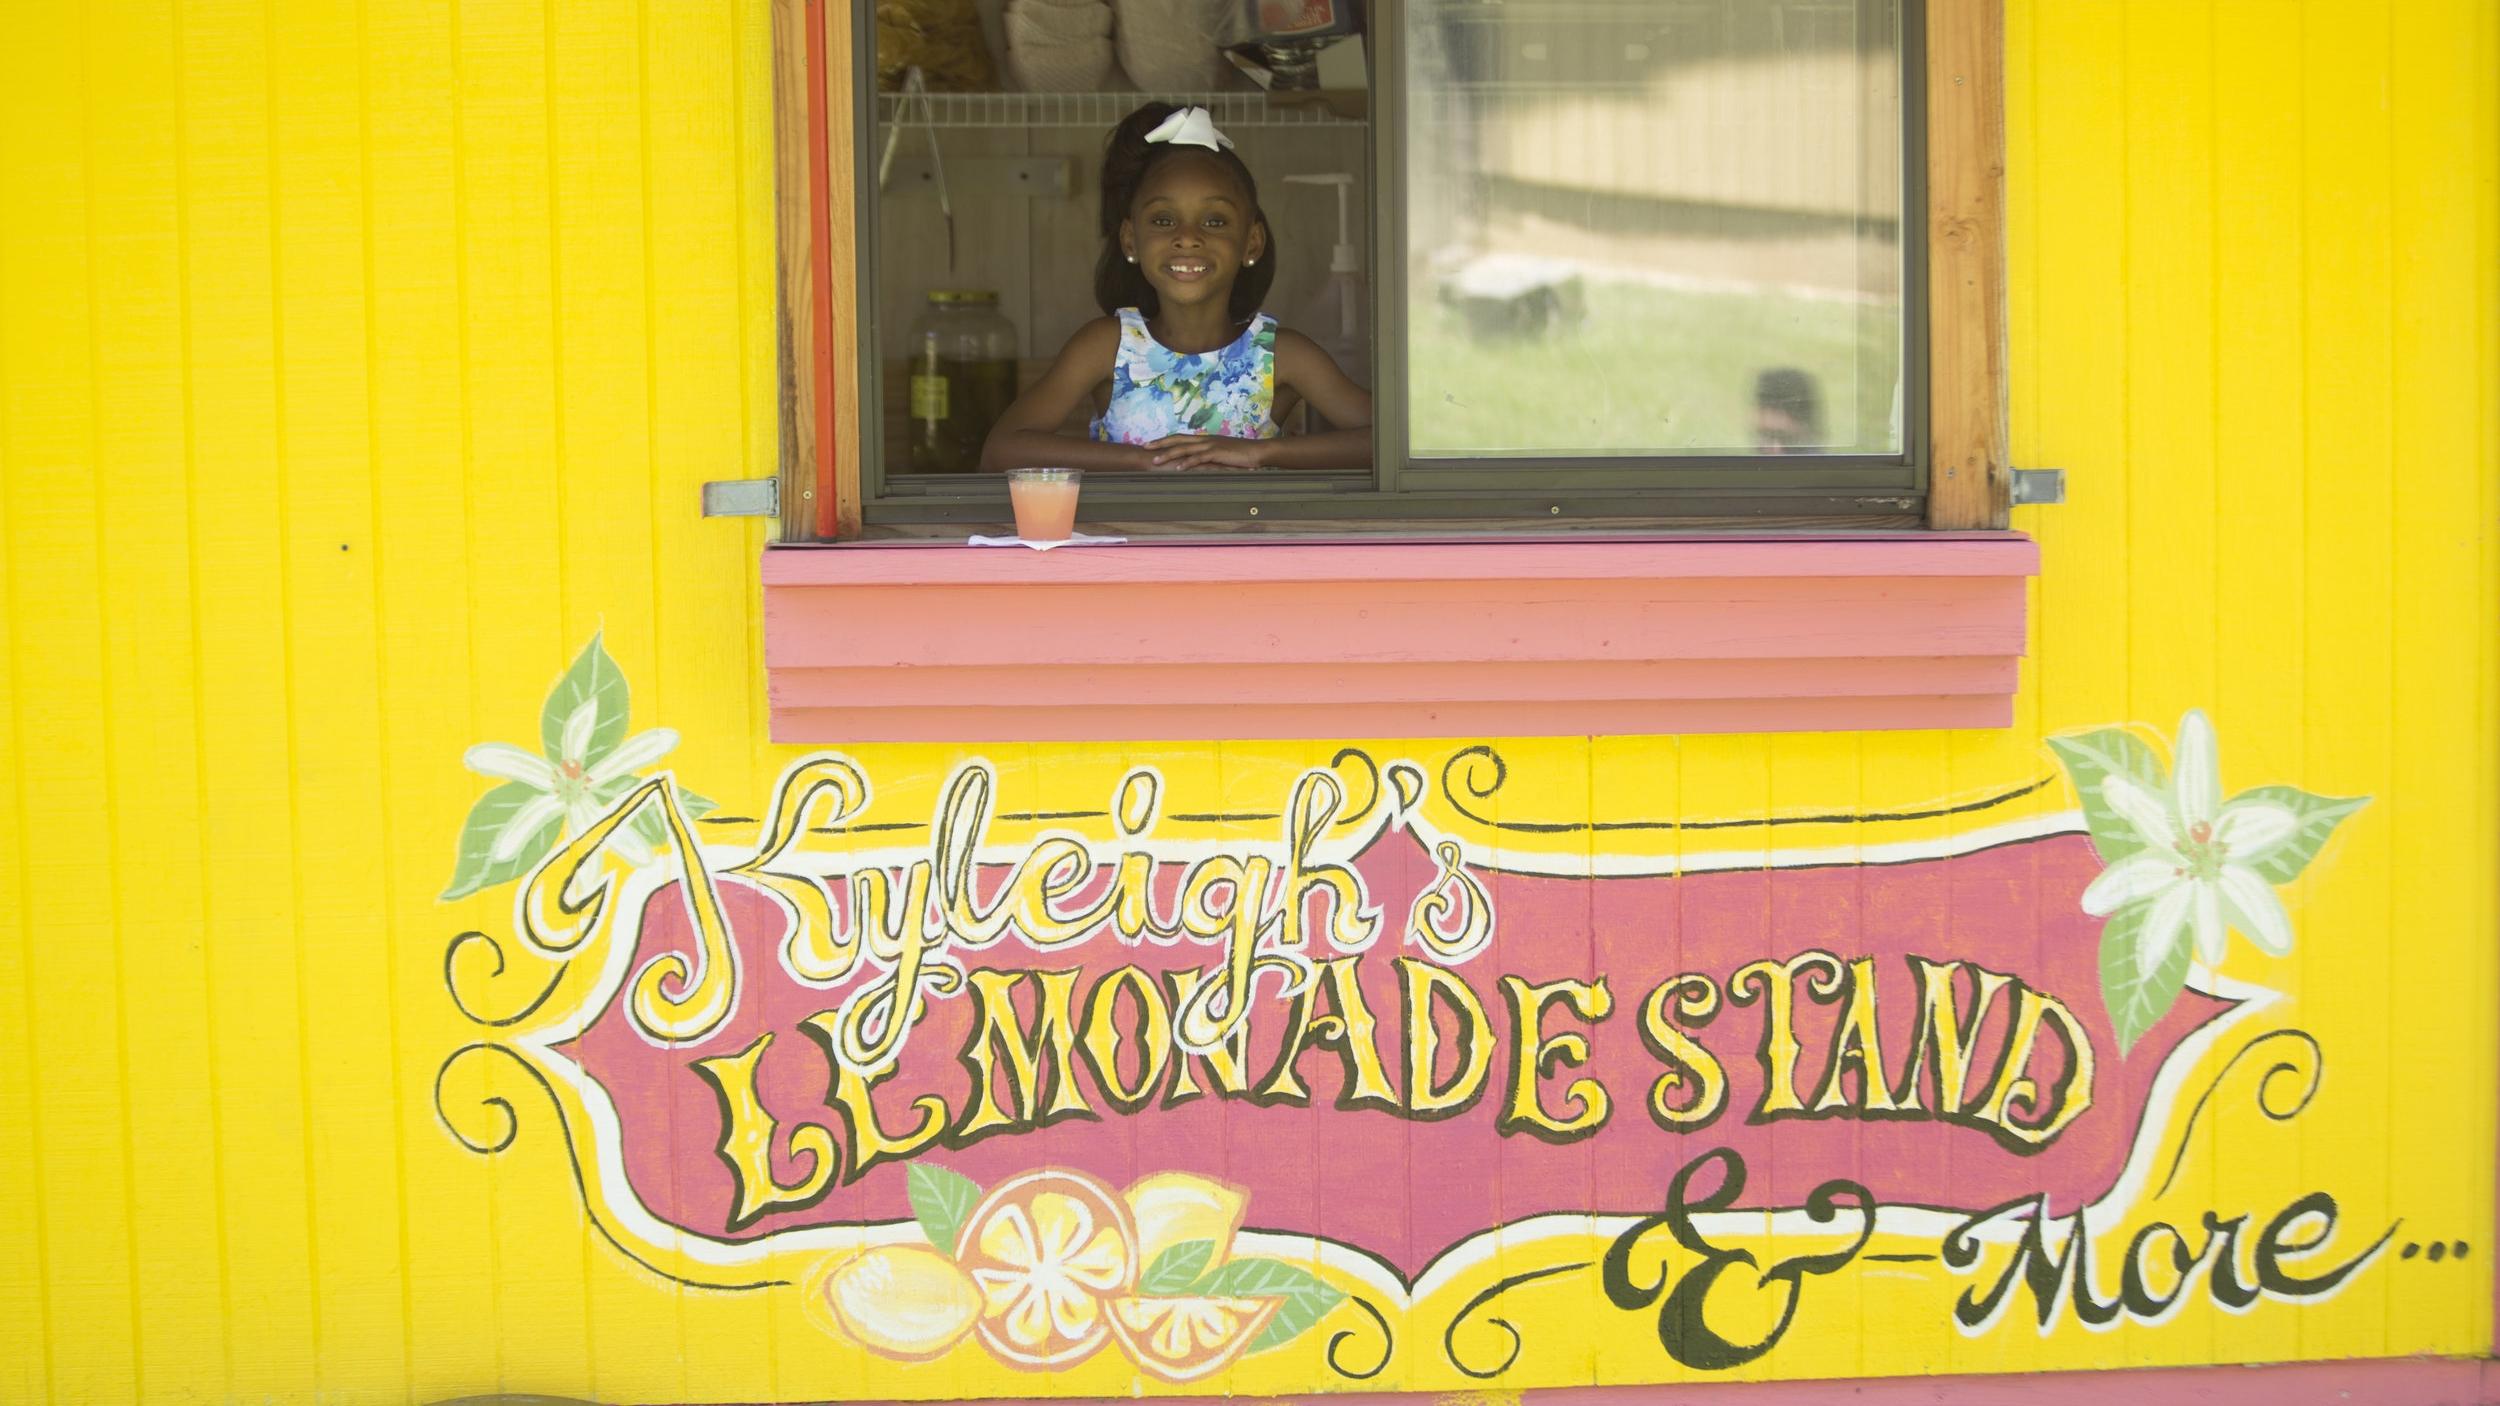 Kyleigh's Lemonade Stand & More